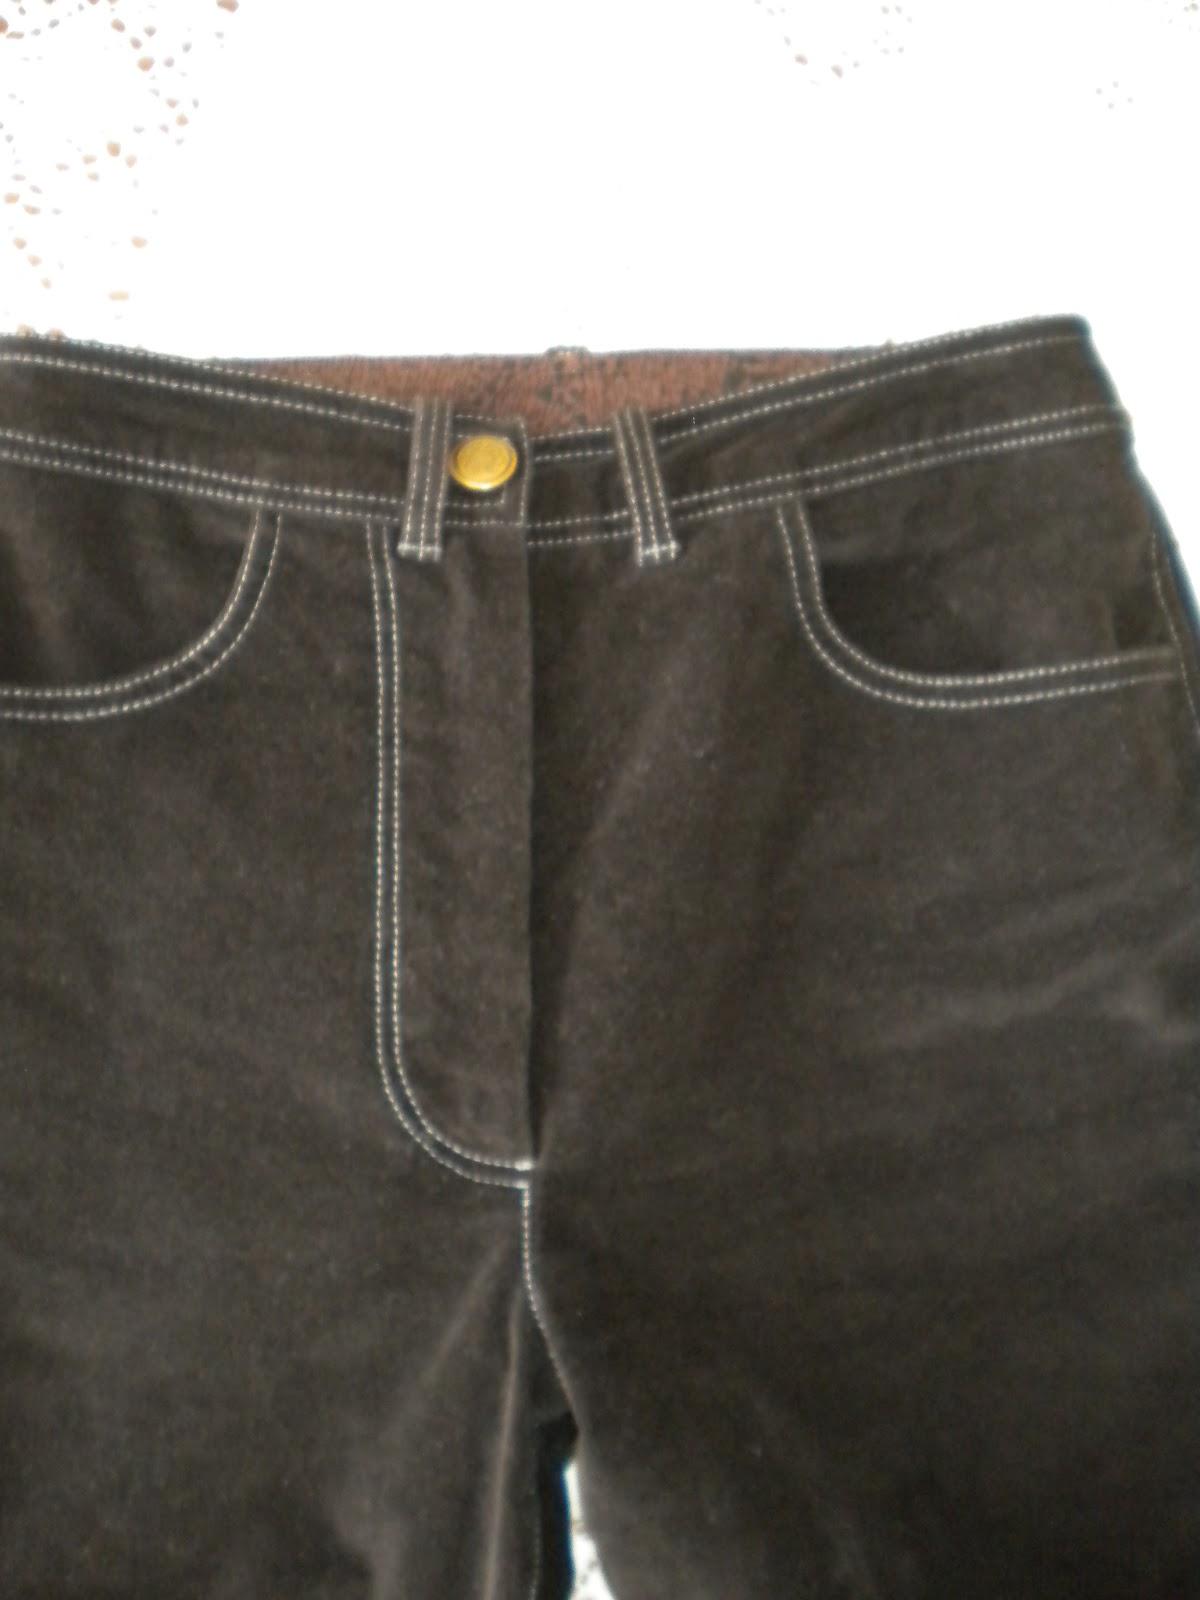 Irene S Studio Chocolate Jeans